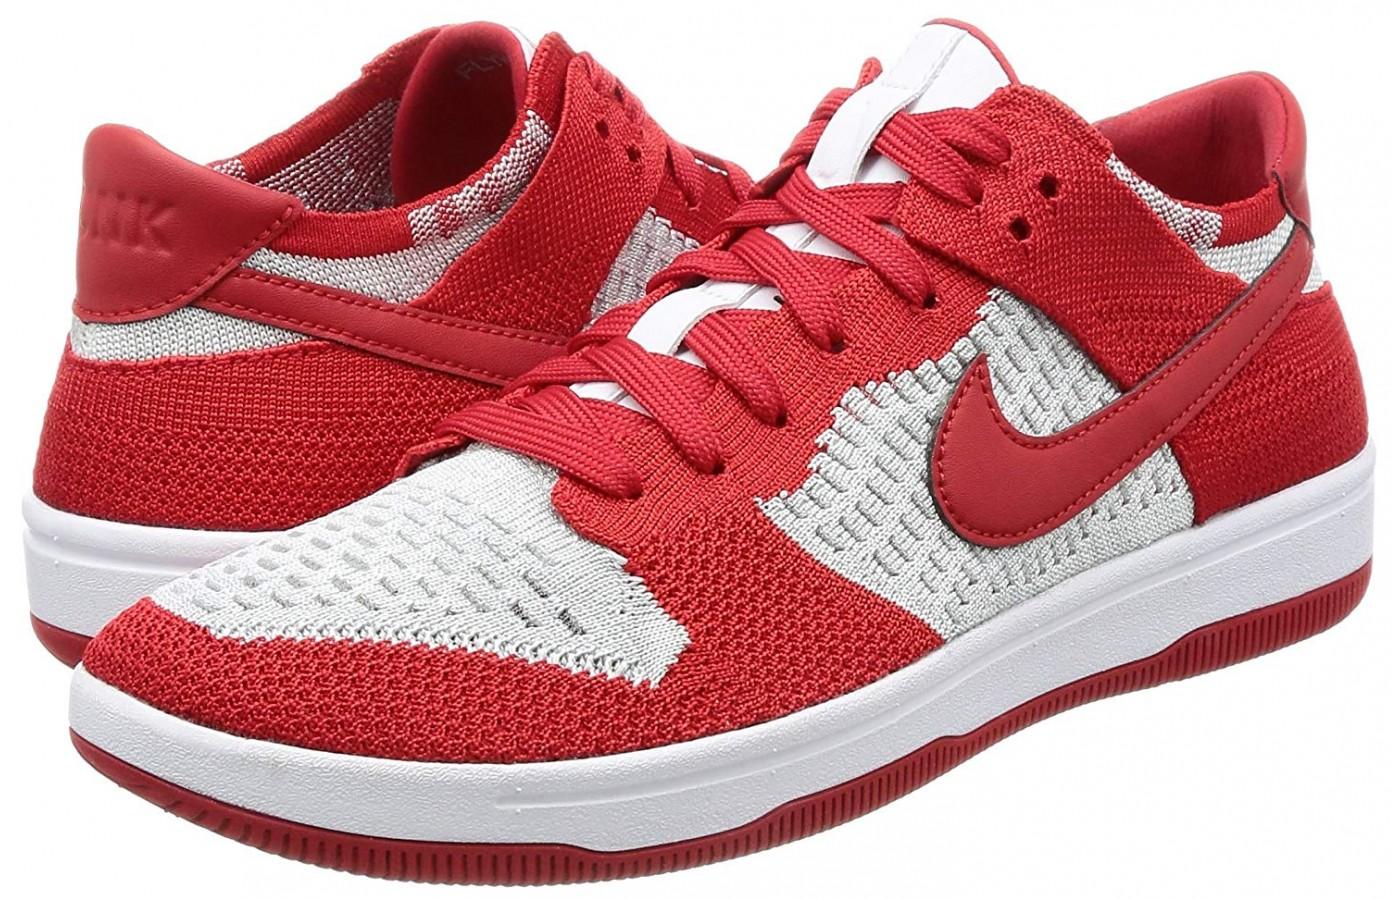 Nike Dunk Flyknit pair